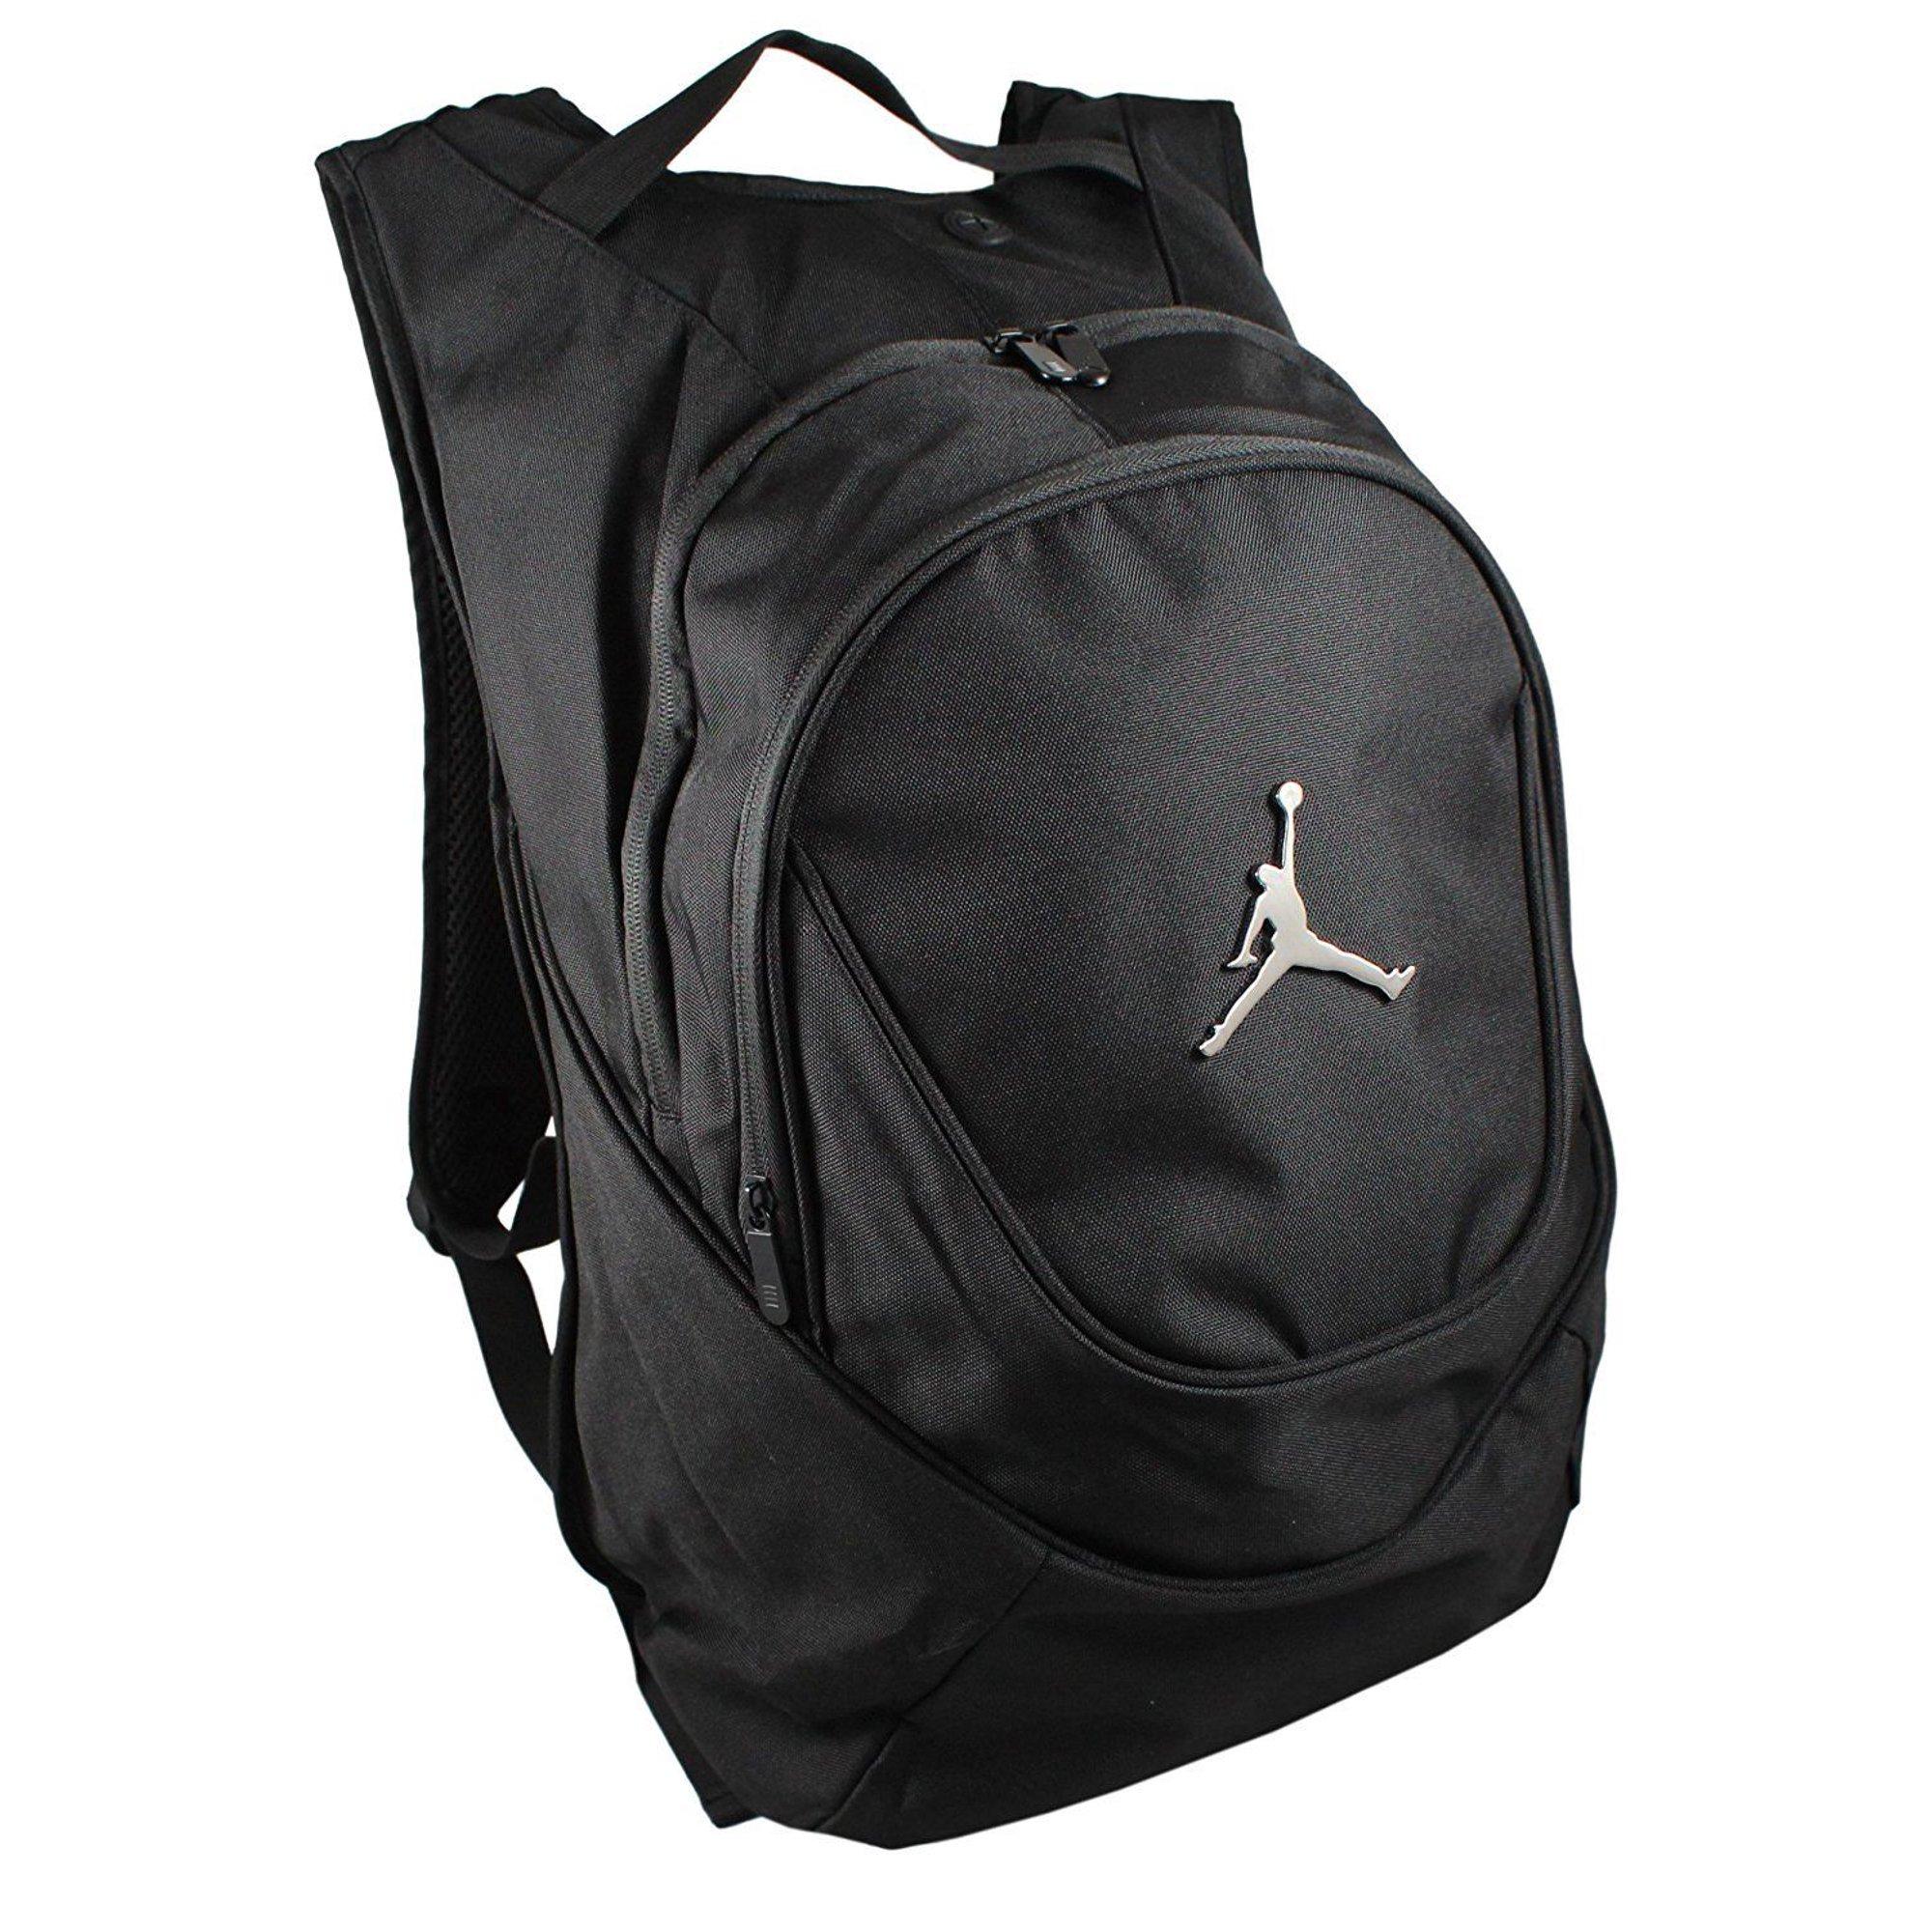 b635442629 Buy Nike Jordan Jumpman 23 Round Shell Style Backpack - Black ...